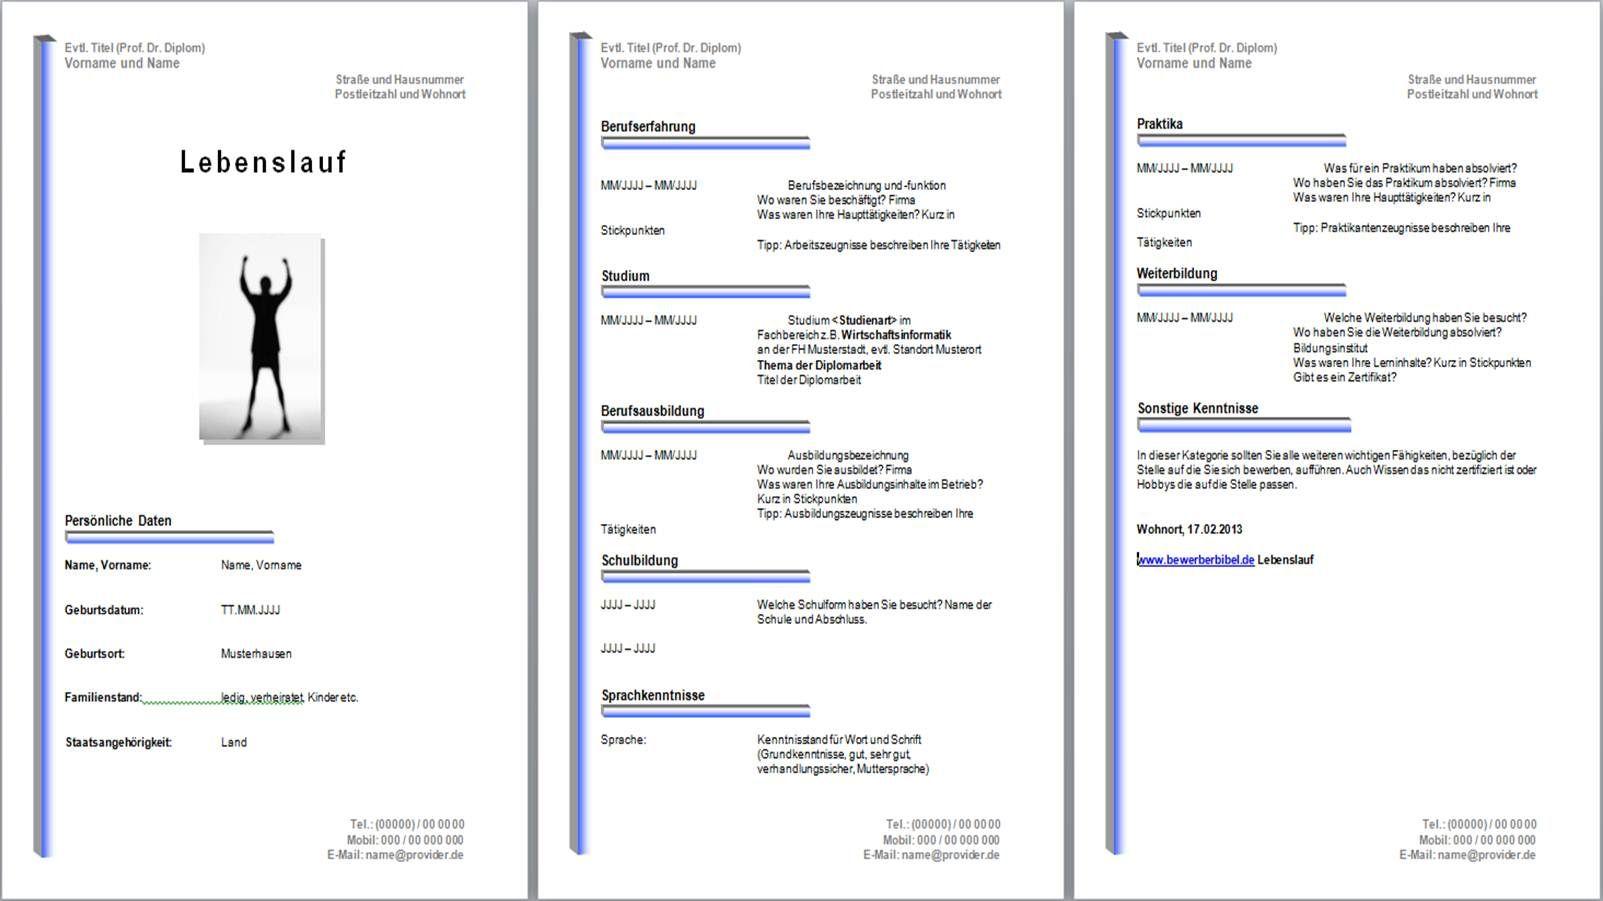 Lebenslauf Muster kostenlos, Muster, Beispiel gratis downloaden ...